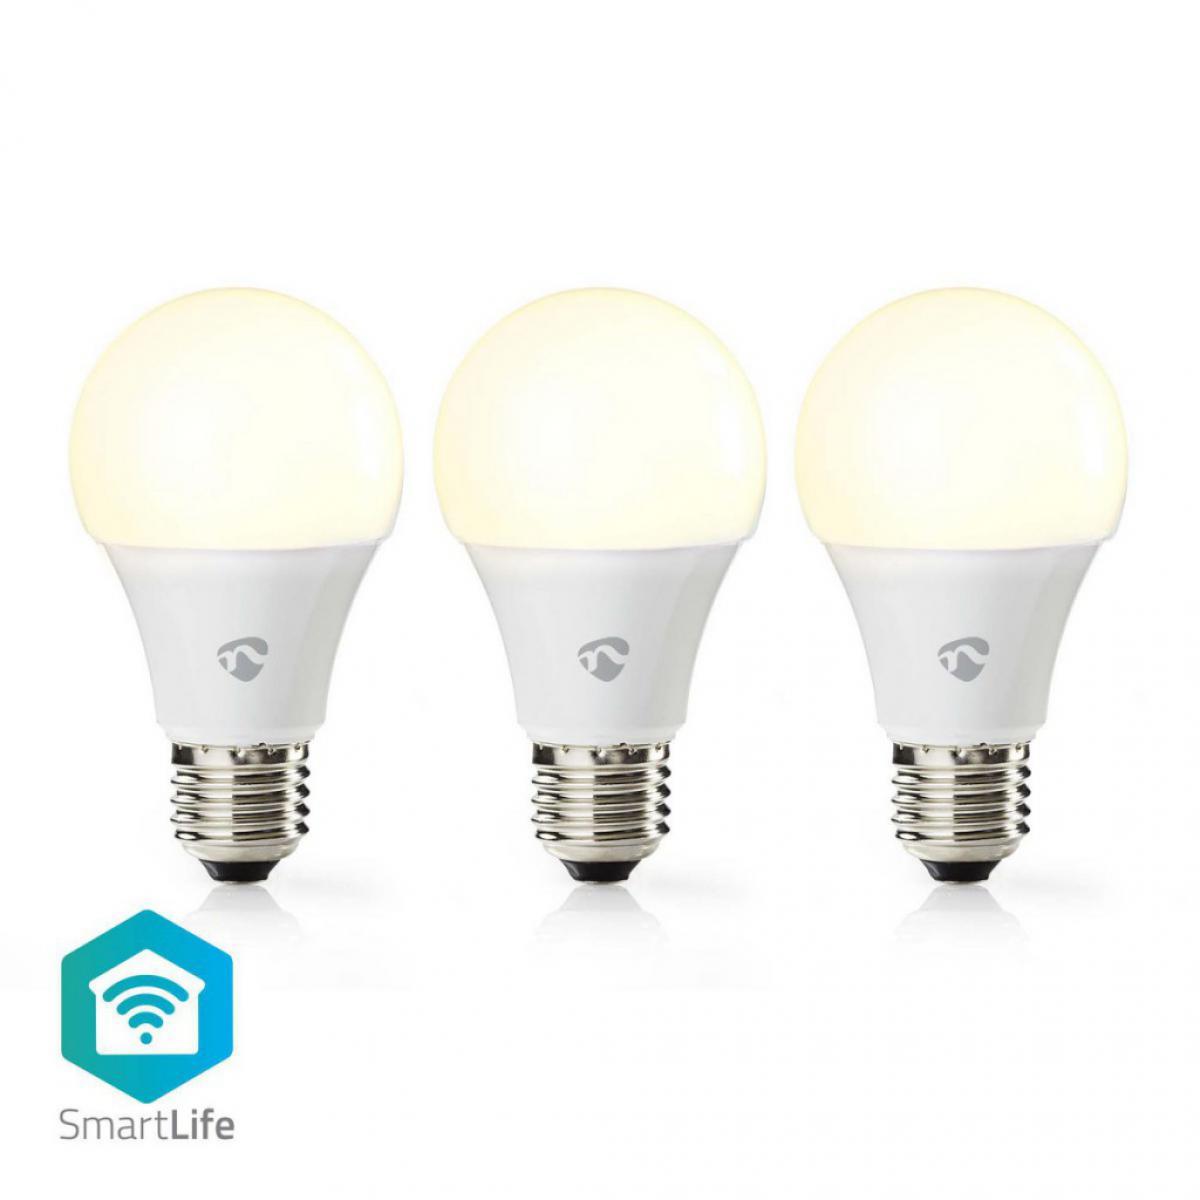 Alpexe Ampoule LED Intelligente Wi-Fi | Blanc Chaud | E27 | Lot de 3